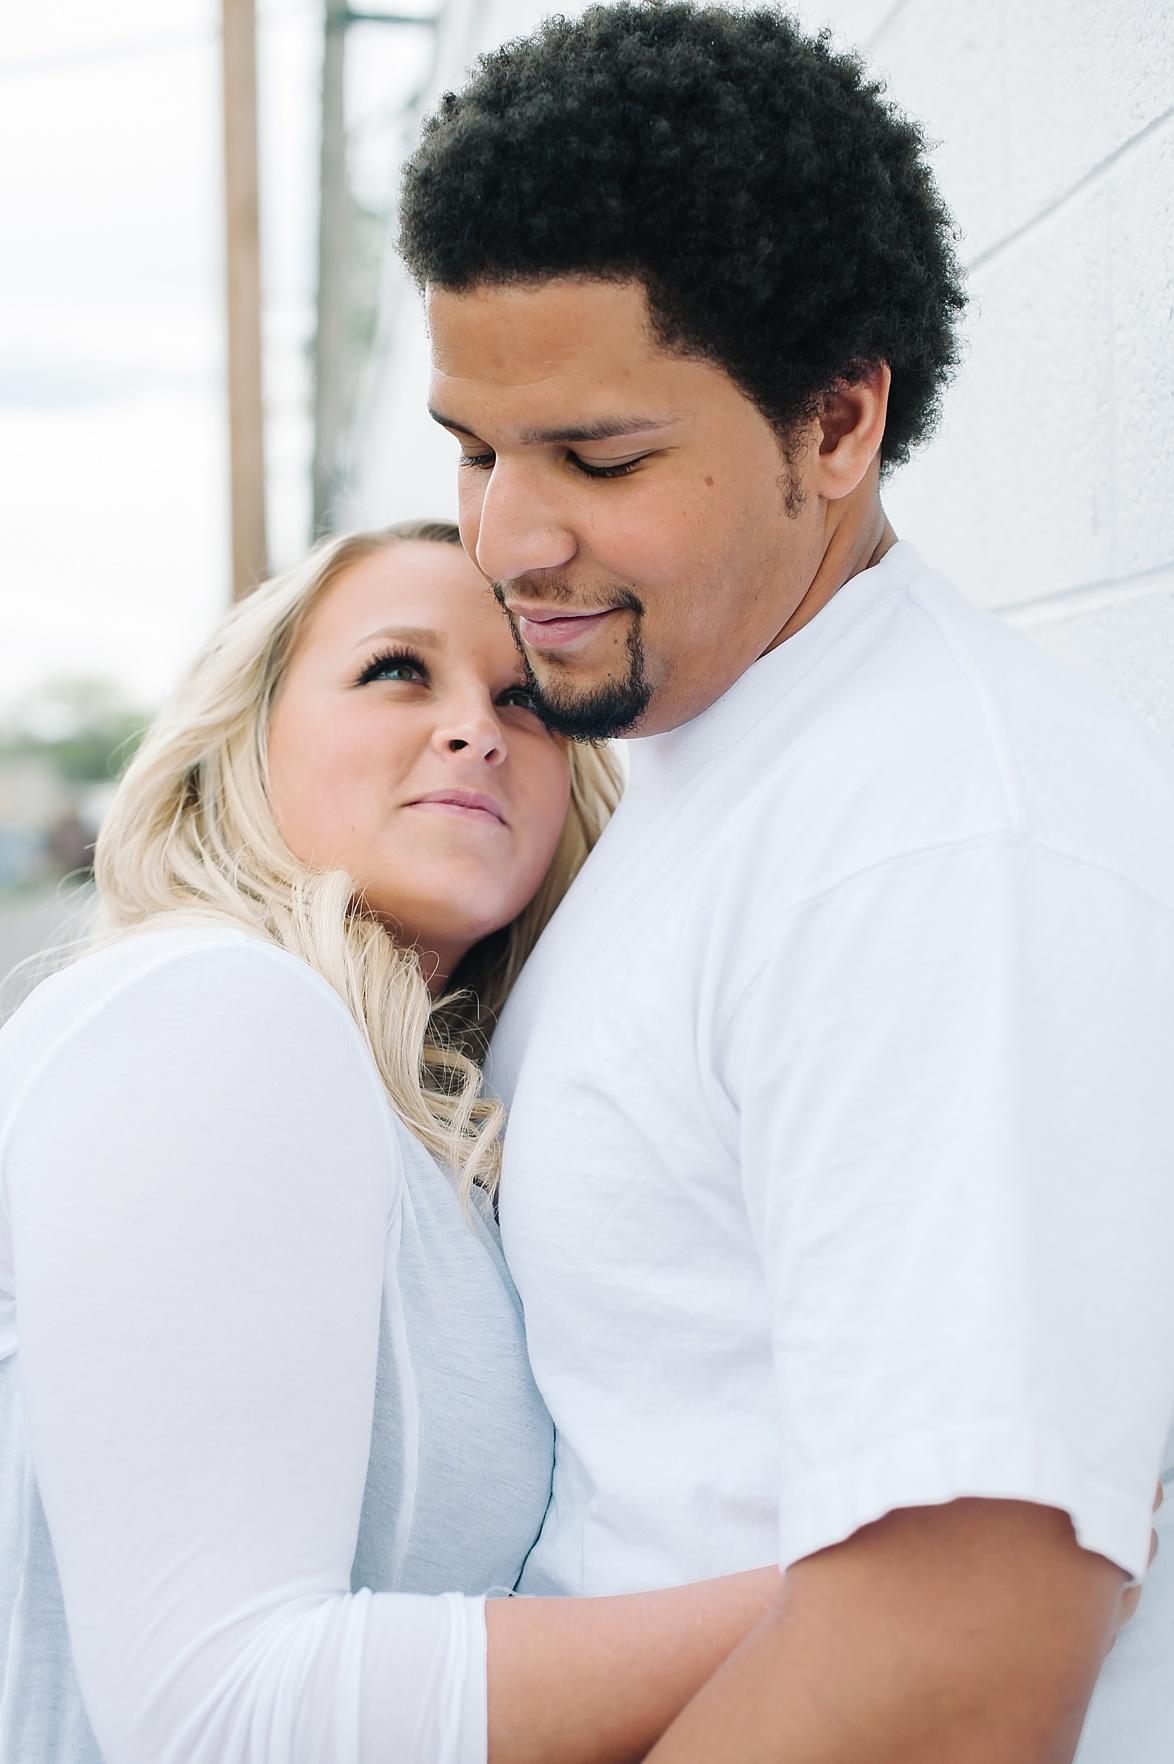 Salt Lake City Wedding Photography Engagement Ali Sumsion 011